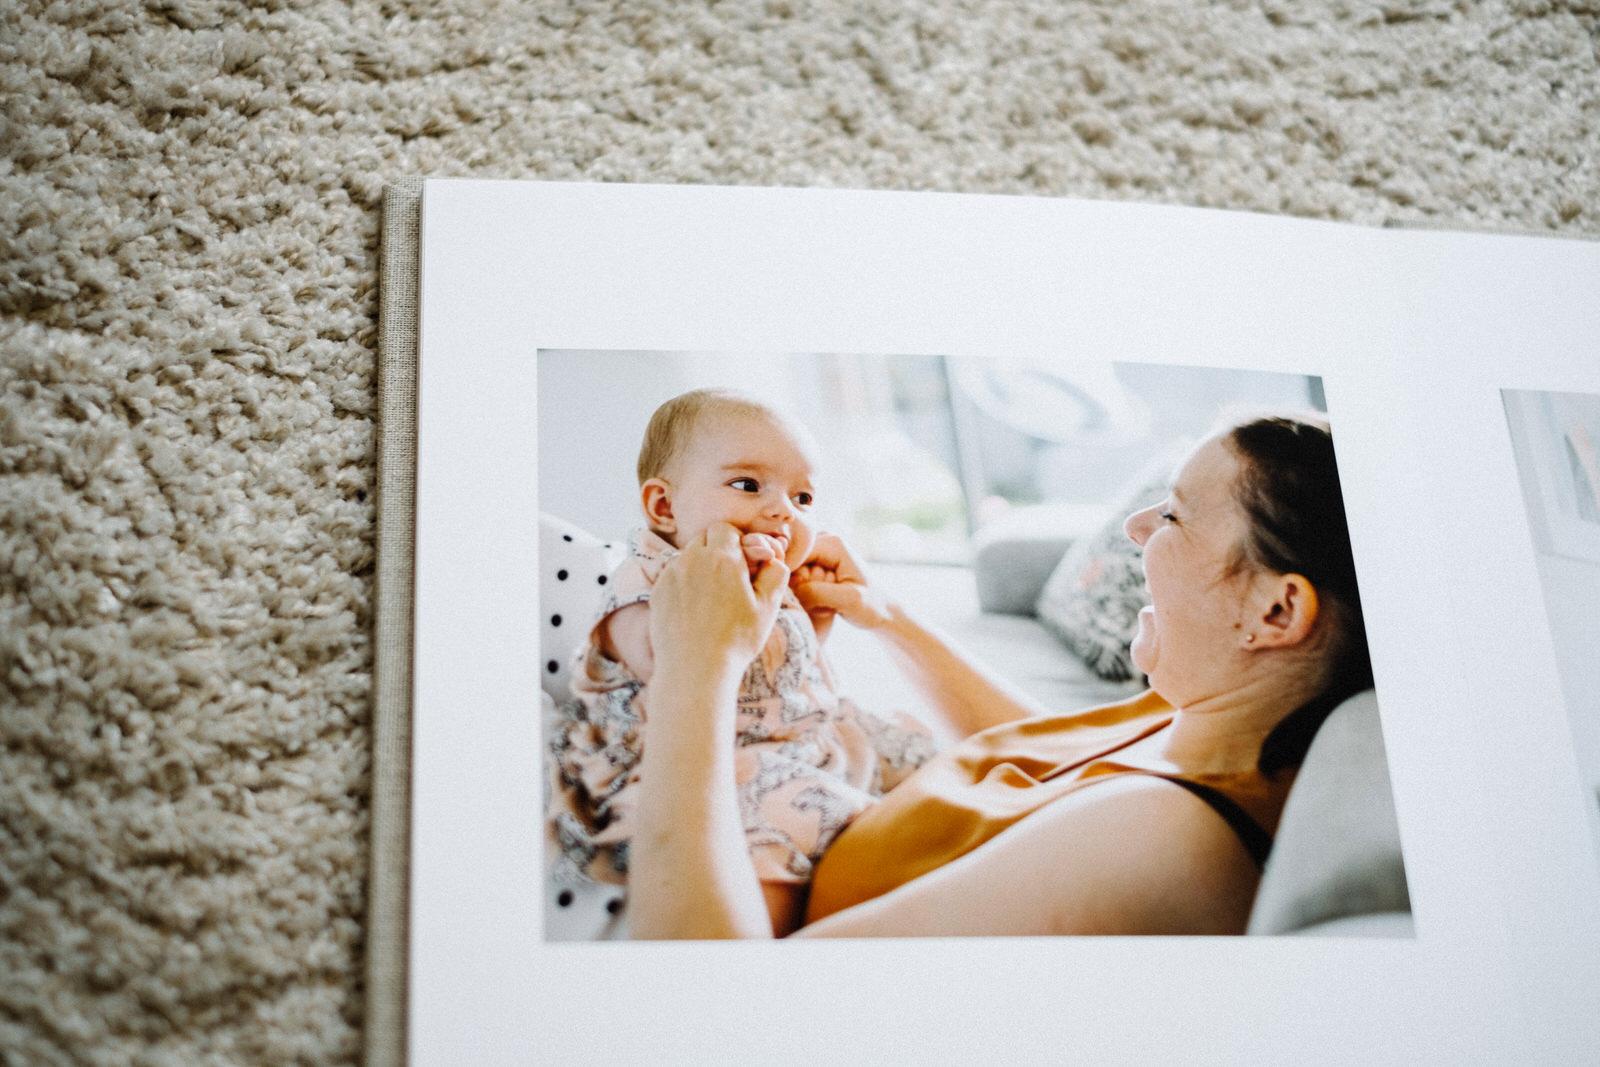 family-story-photos-photo-album-11.jpg